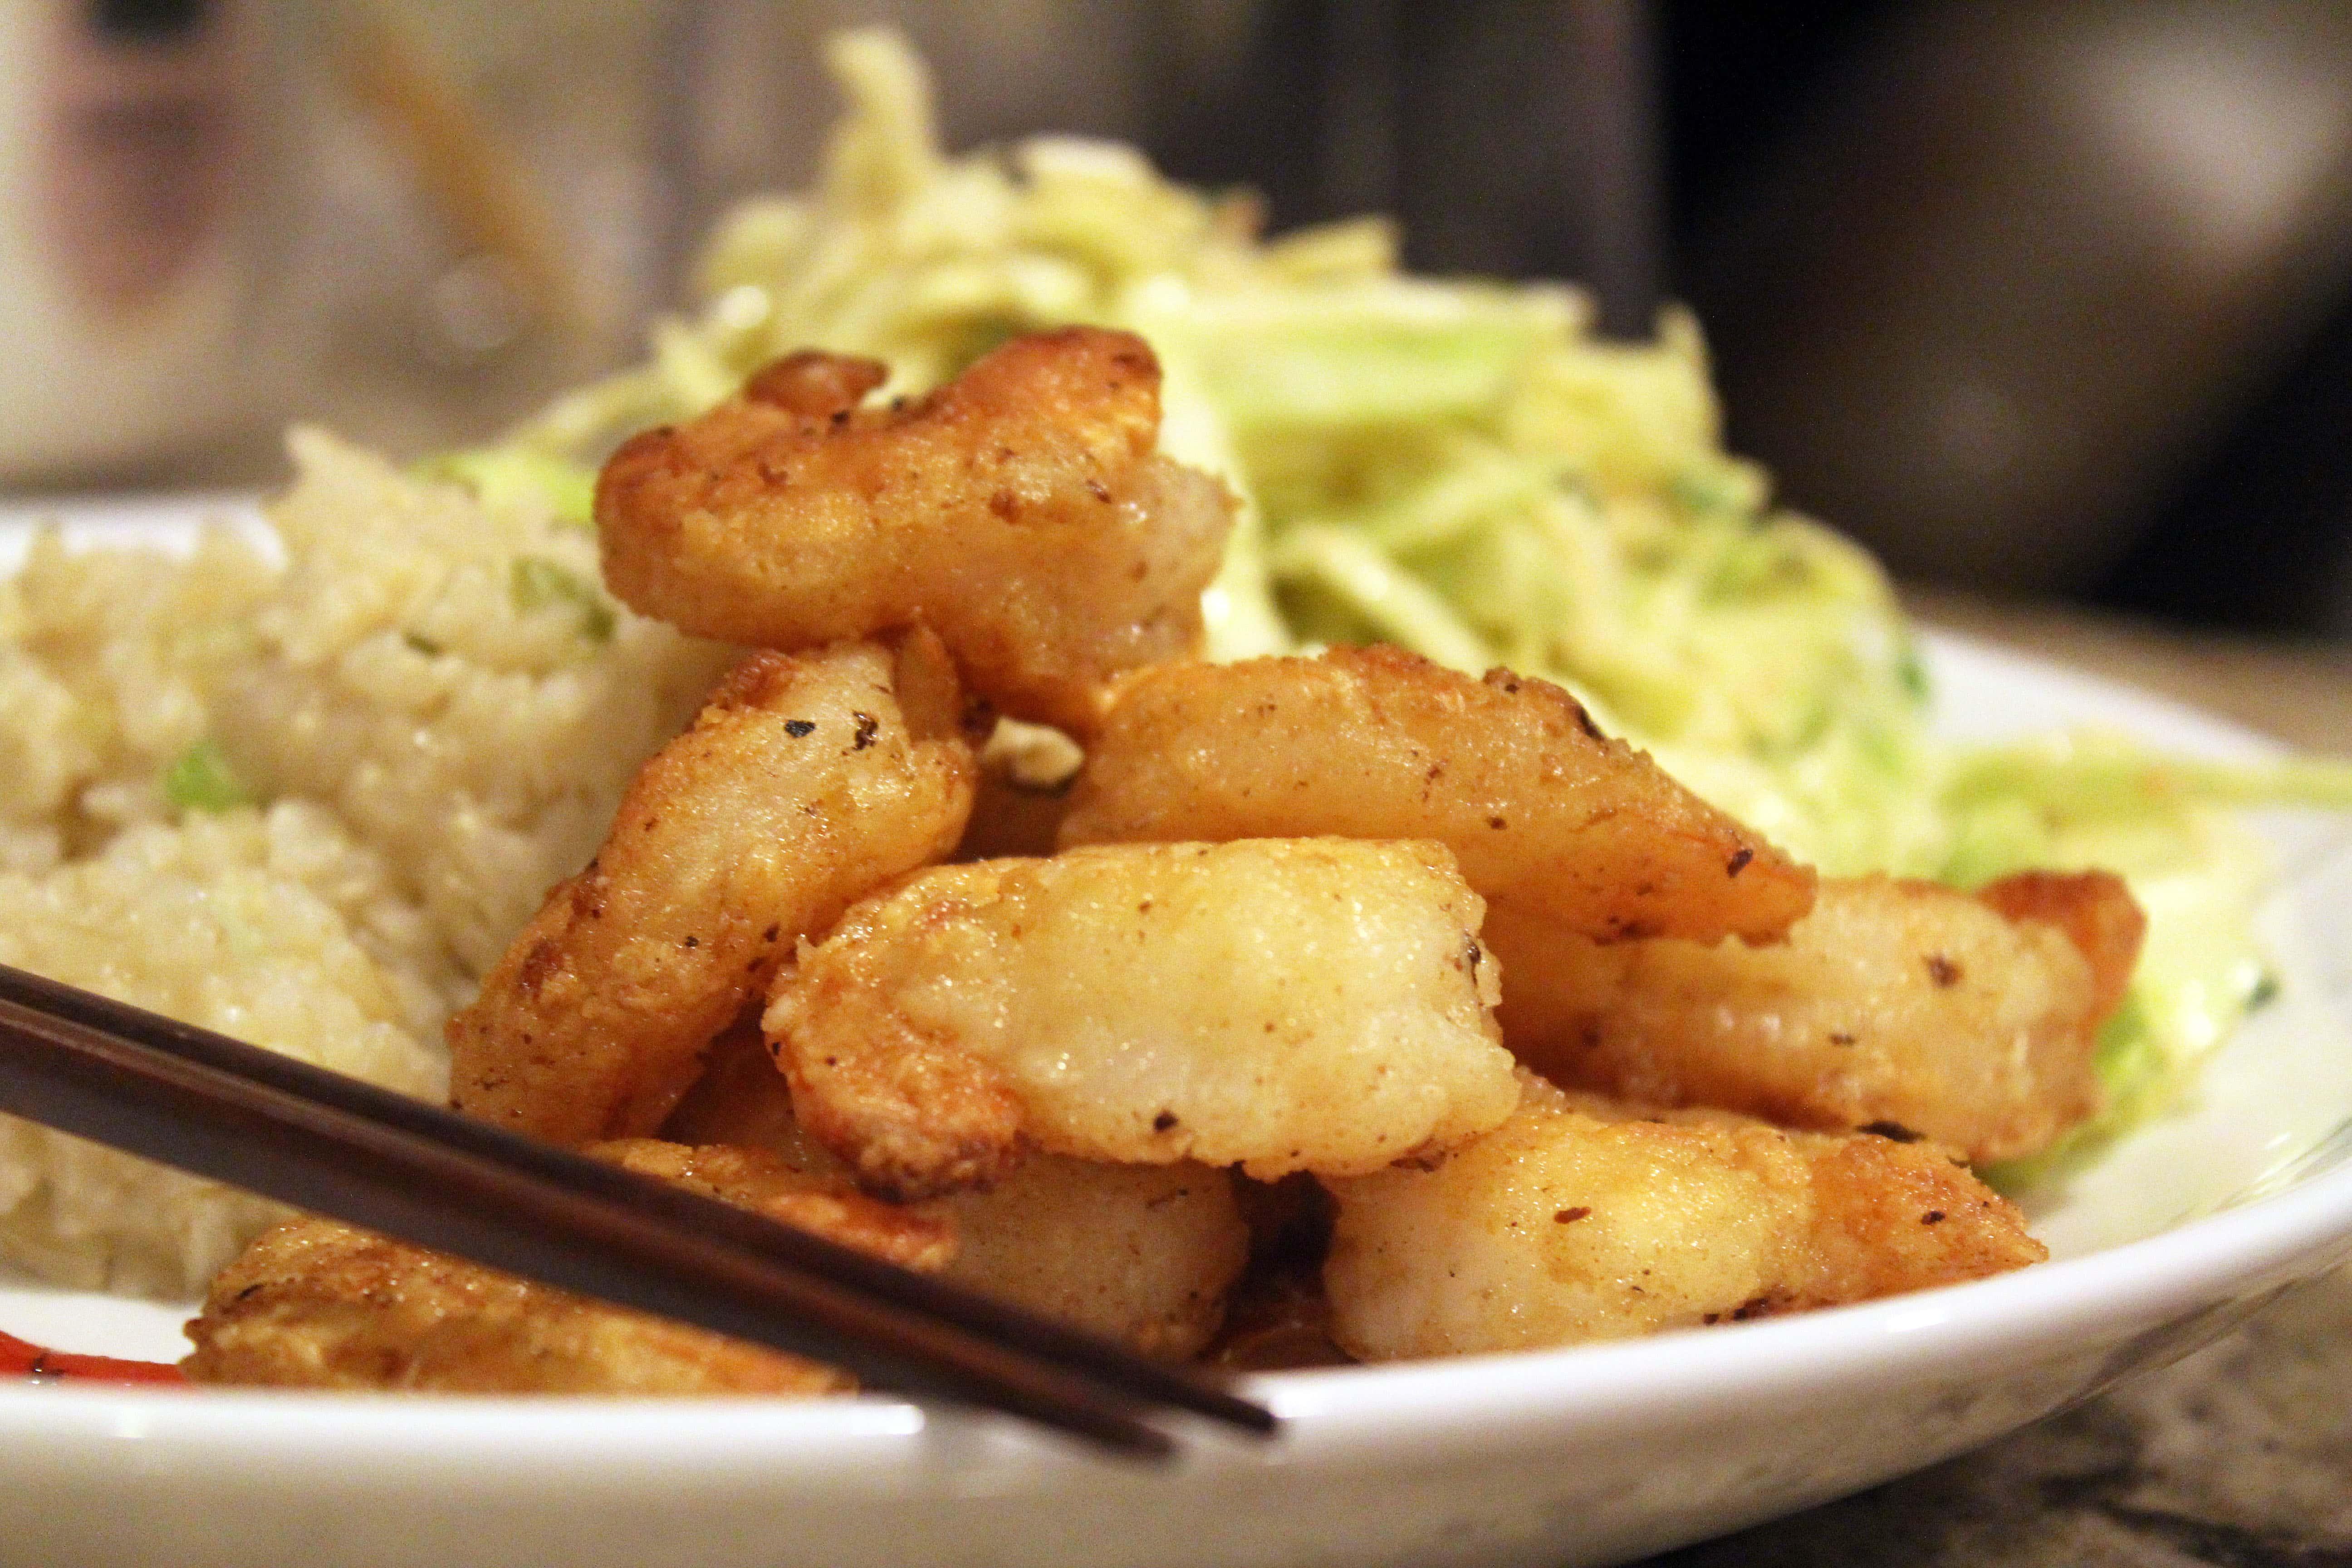 Pile of delicious shrimp